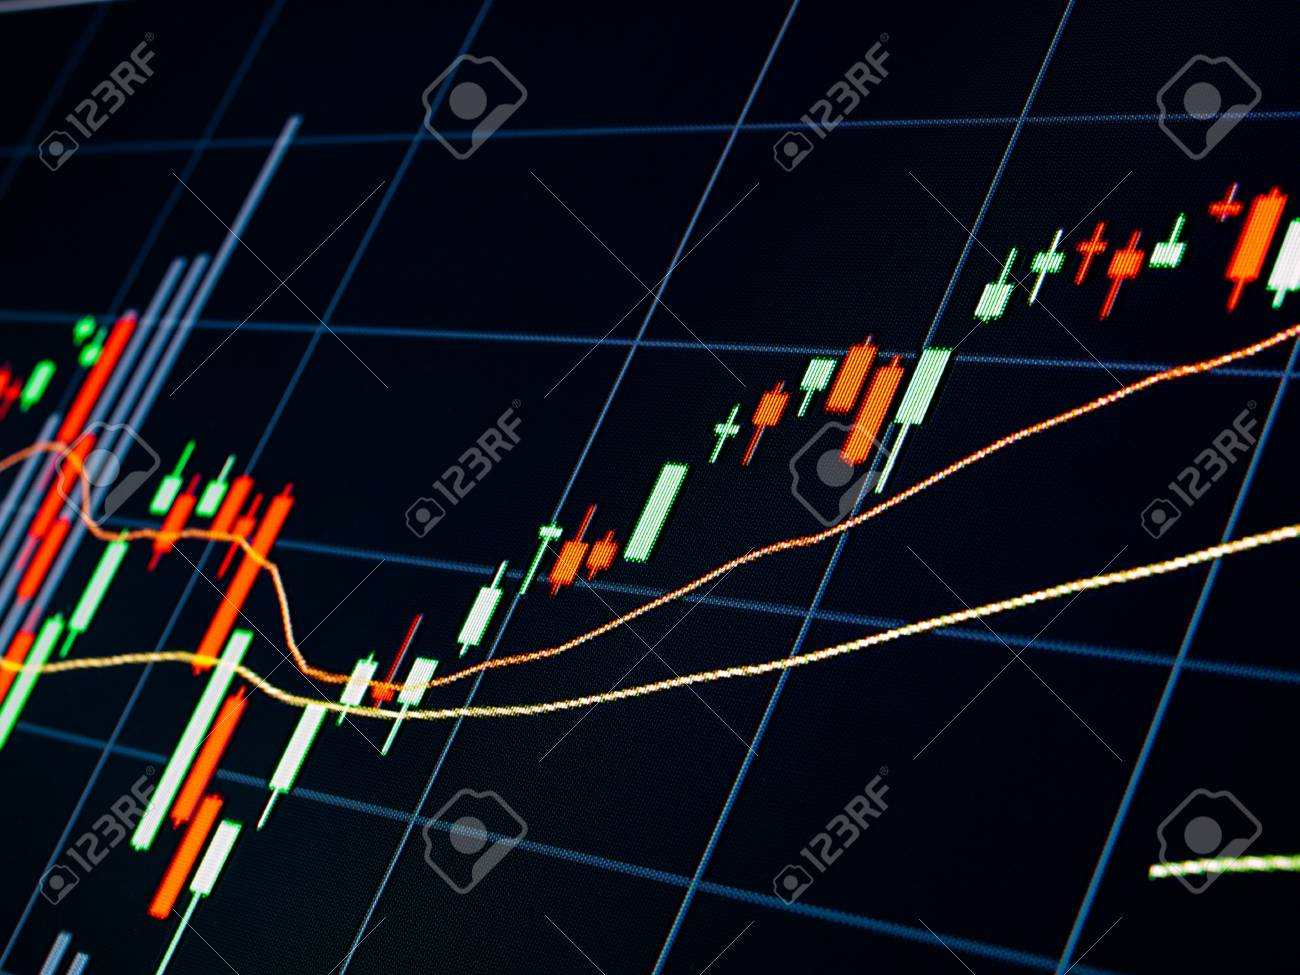 Stock Market Chart on led screen Stock Photo - 21647349